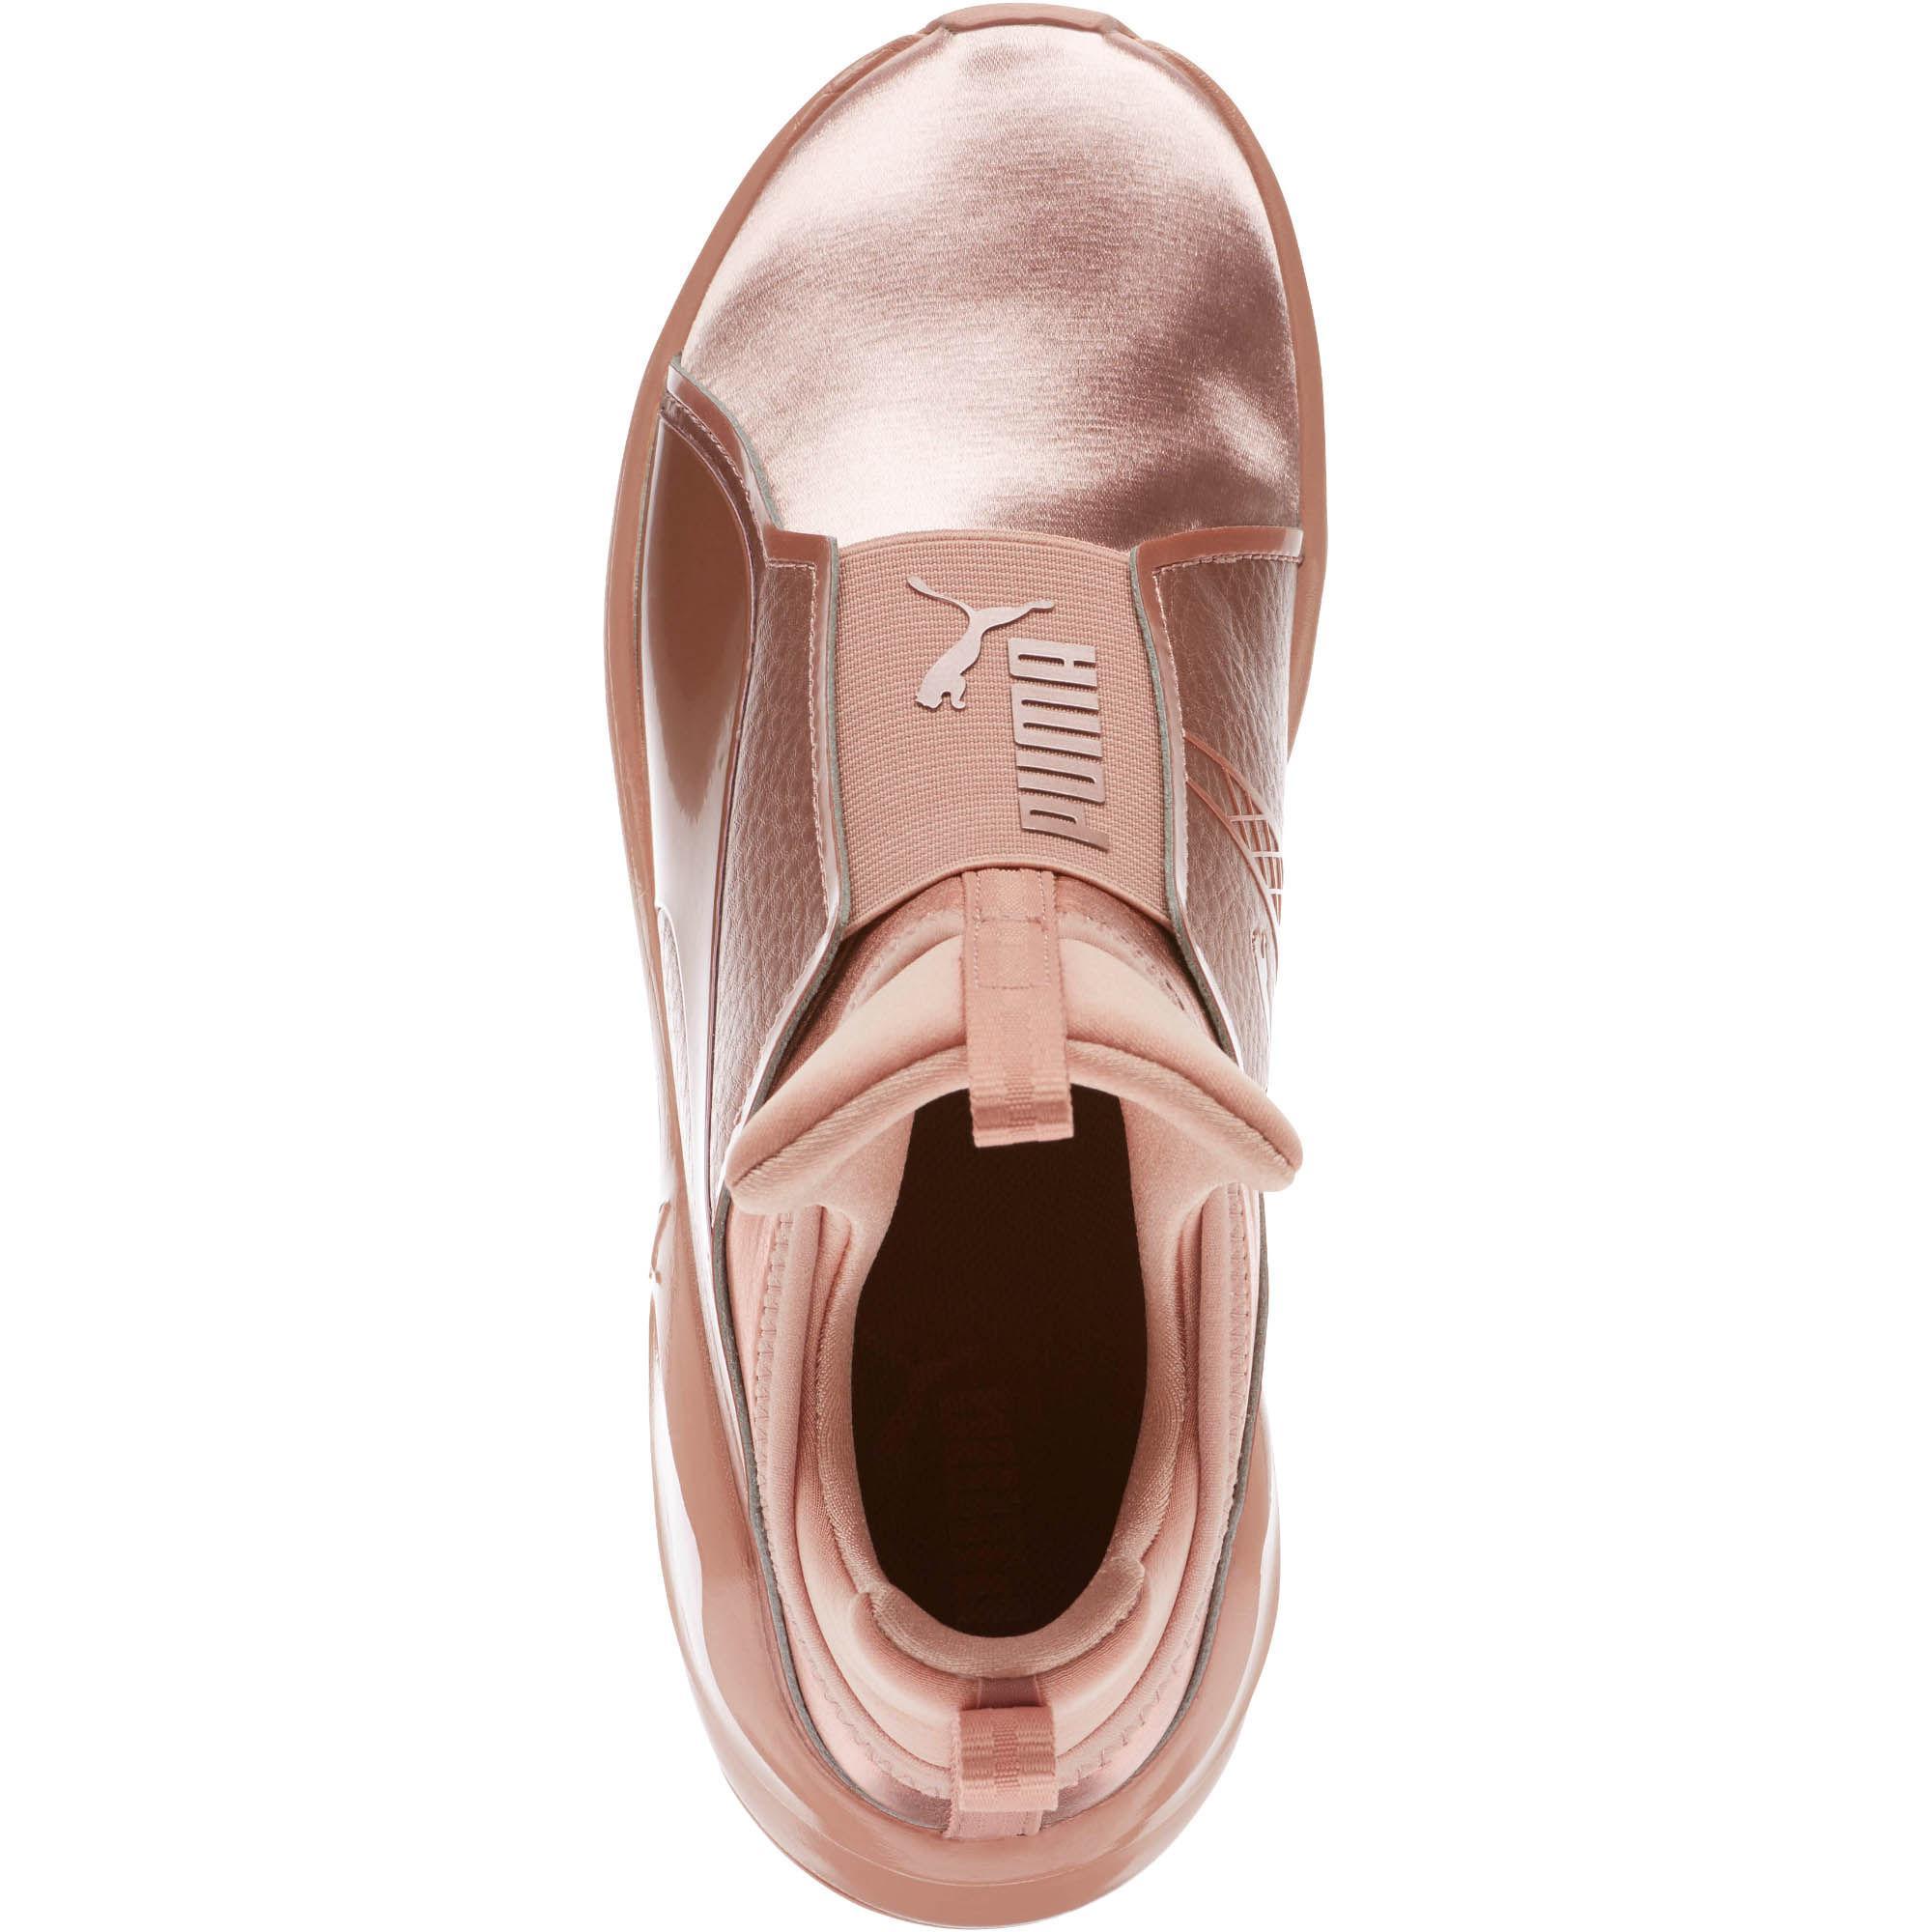 916fc6eb9b35 Lyst - PUMA Fierce Copper Vr Women s Training Shoes in Pink